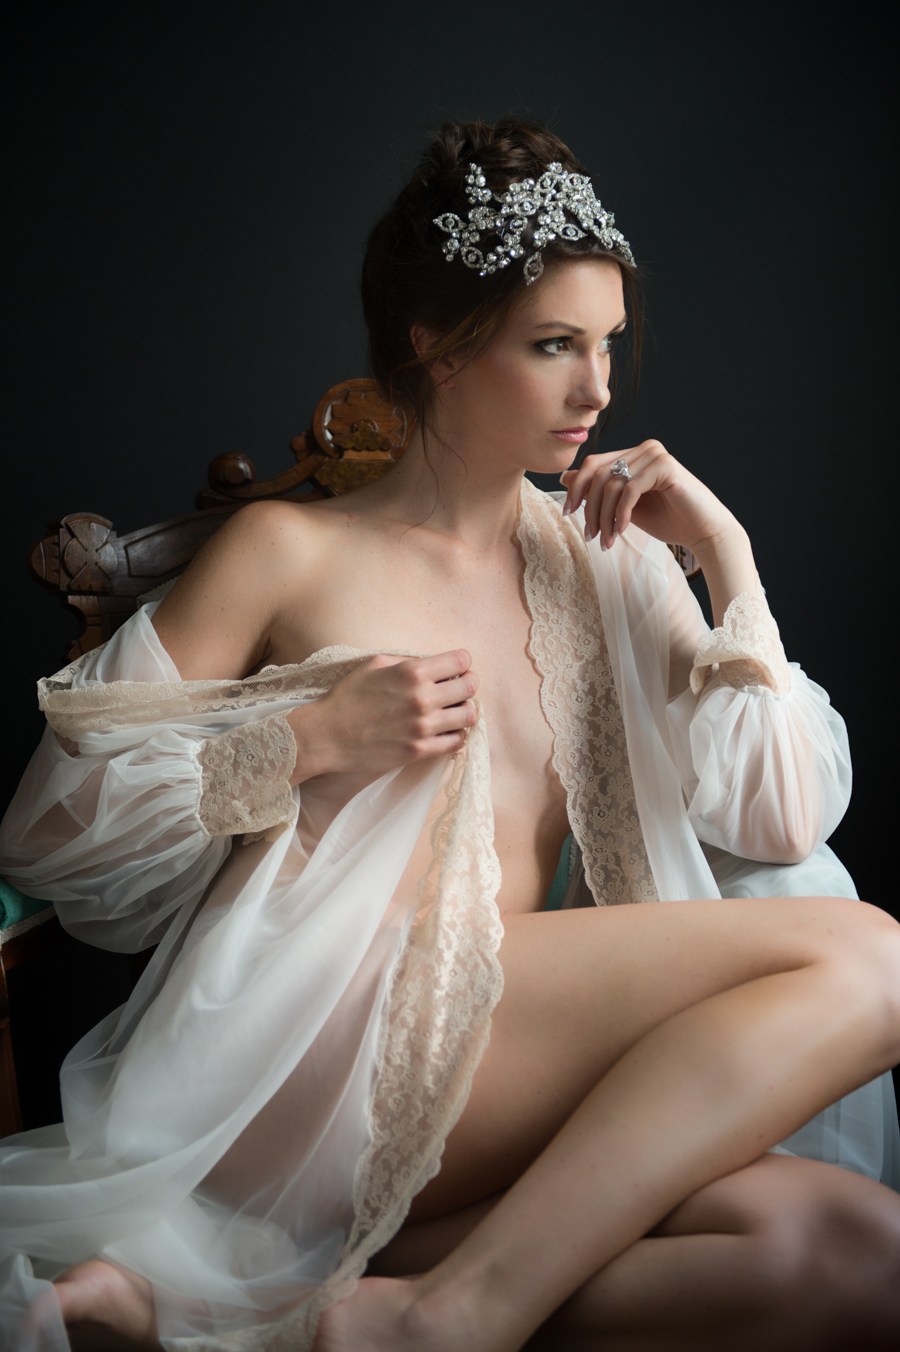 elizabeth-craig-boudoir-photography-001